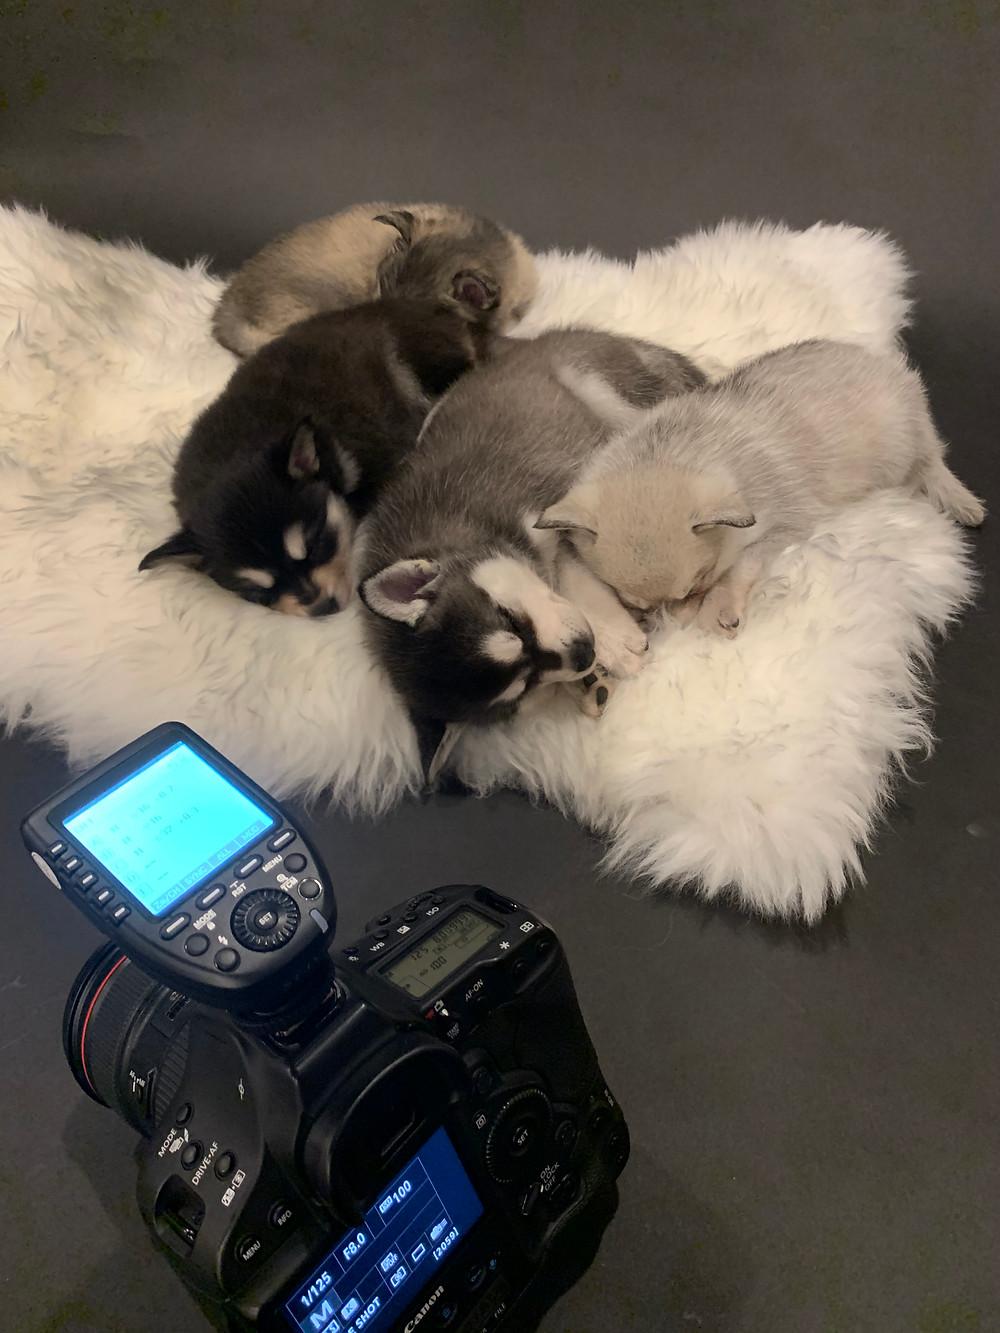 Puppies sleeping next to camera